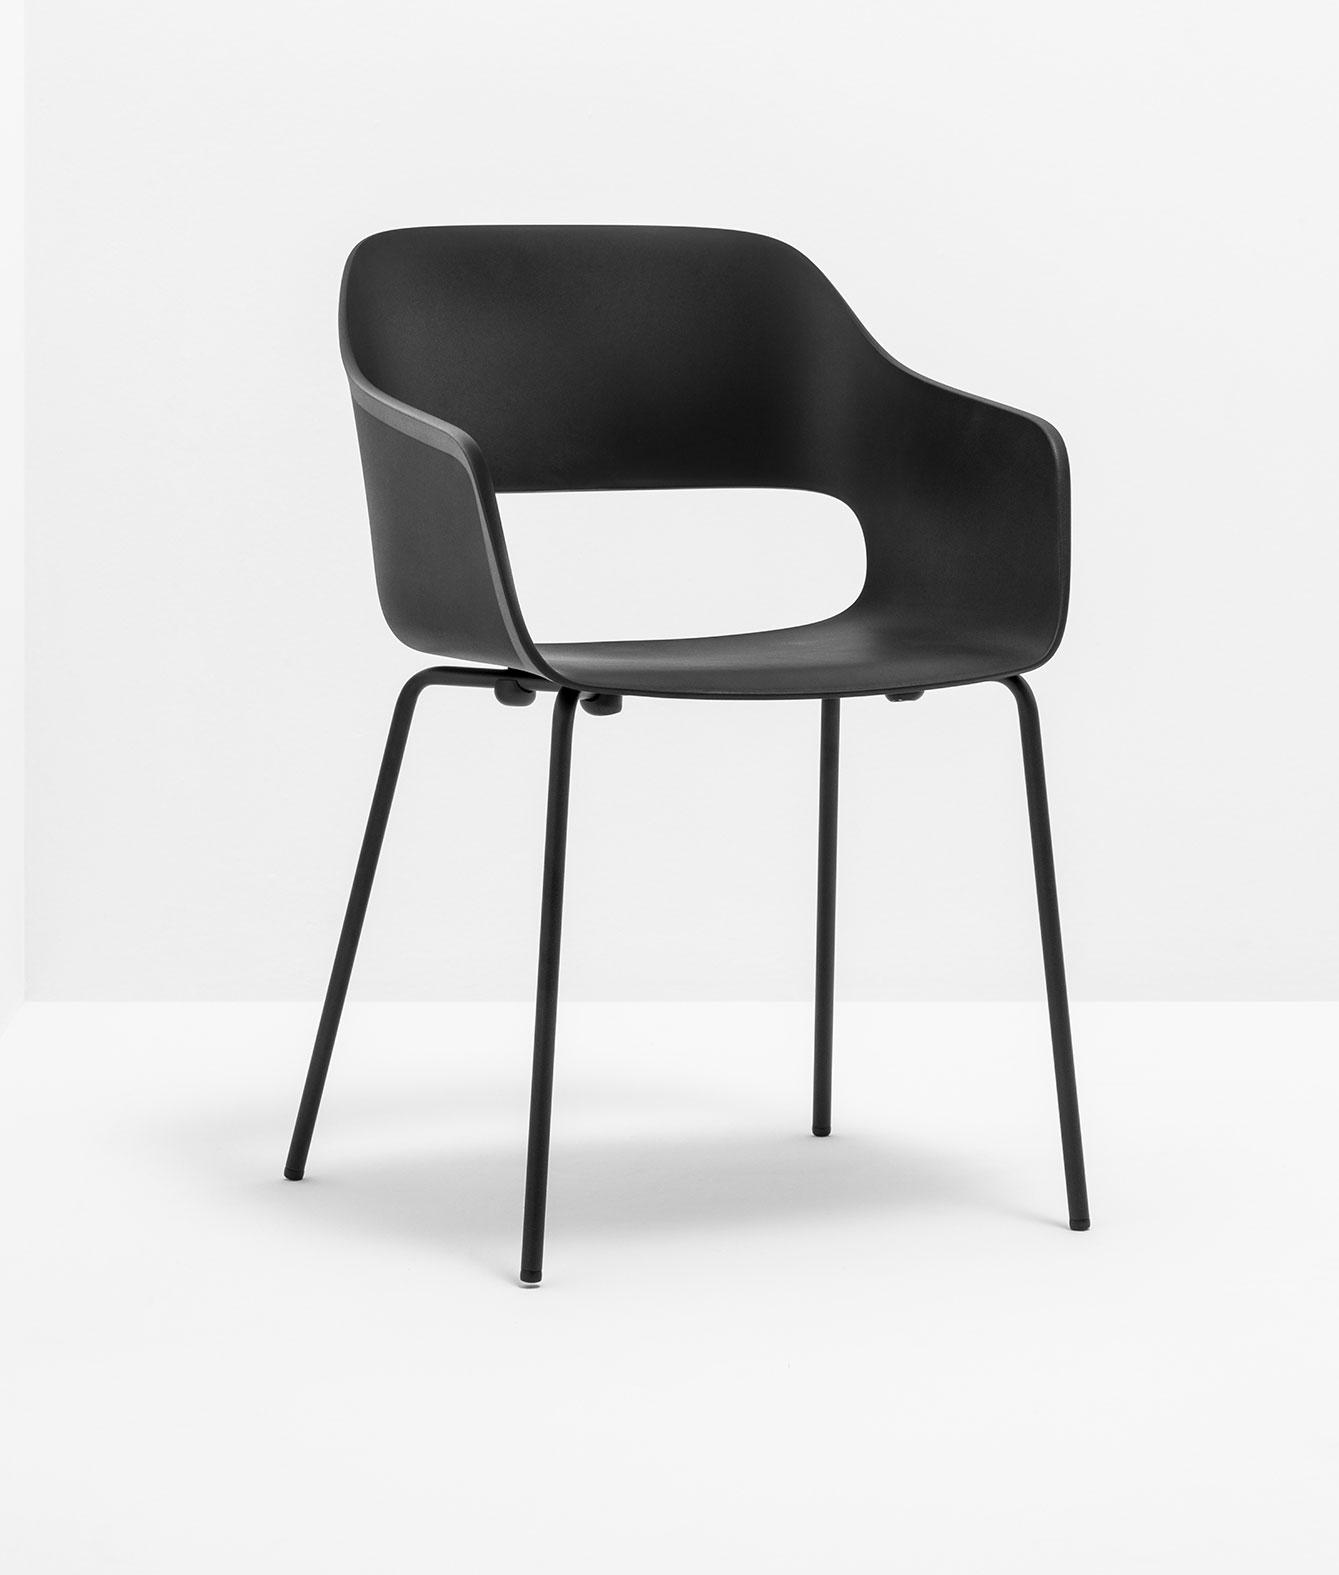 pedrali babila 2735 armlehnstuhl g nstig kaufen bei. Black Bedroom Furniture Sets. Home Design Ideas